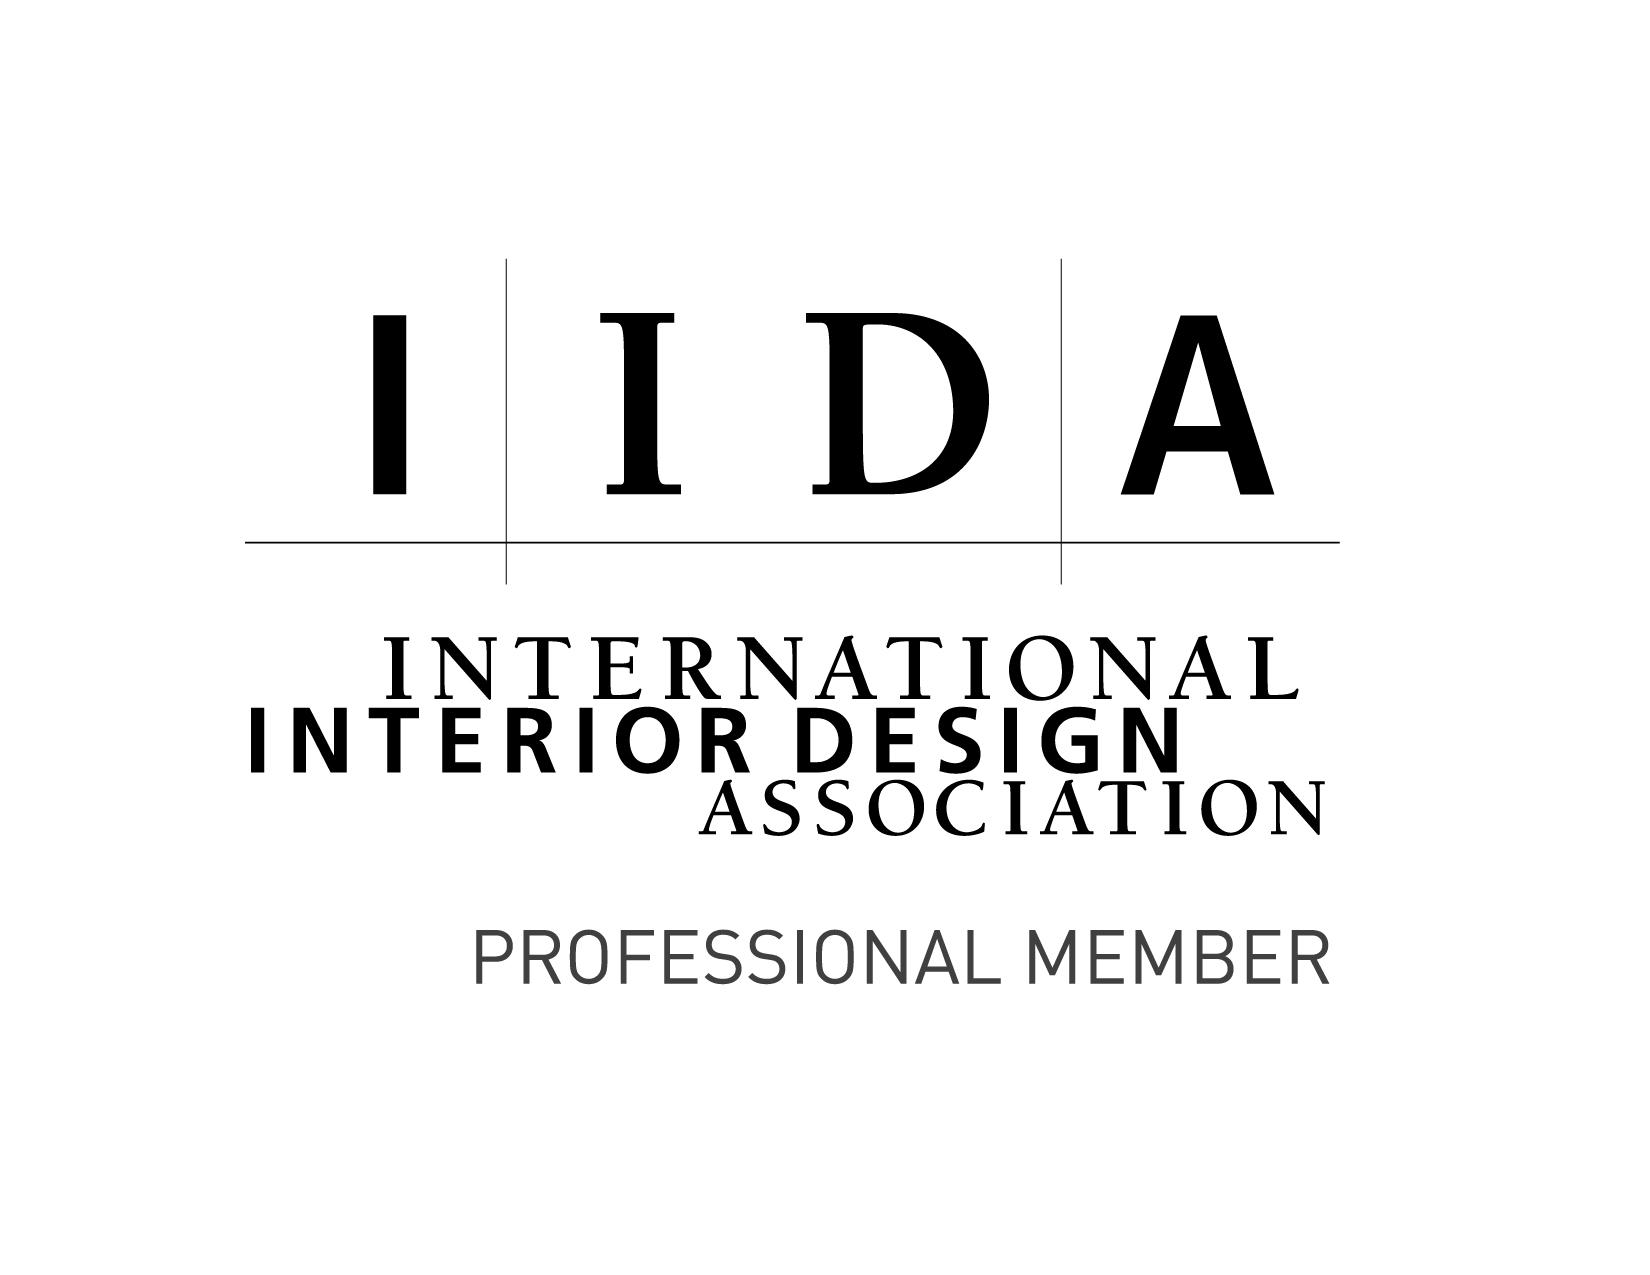 IIDA_ProfMemberLogo-01 (1).jpg